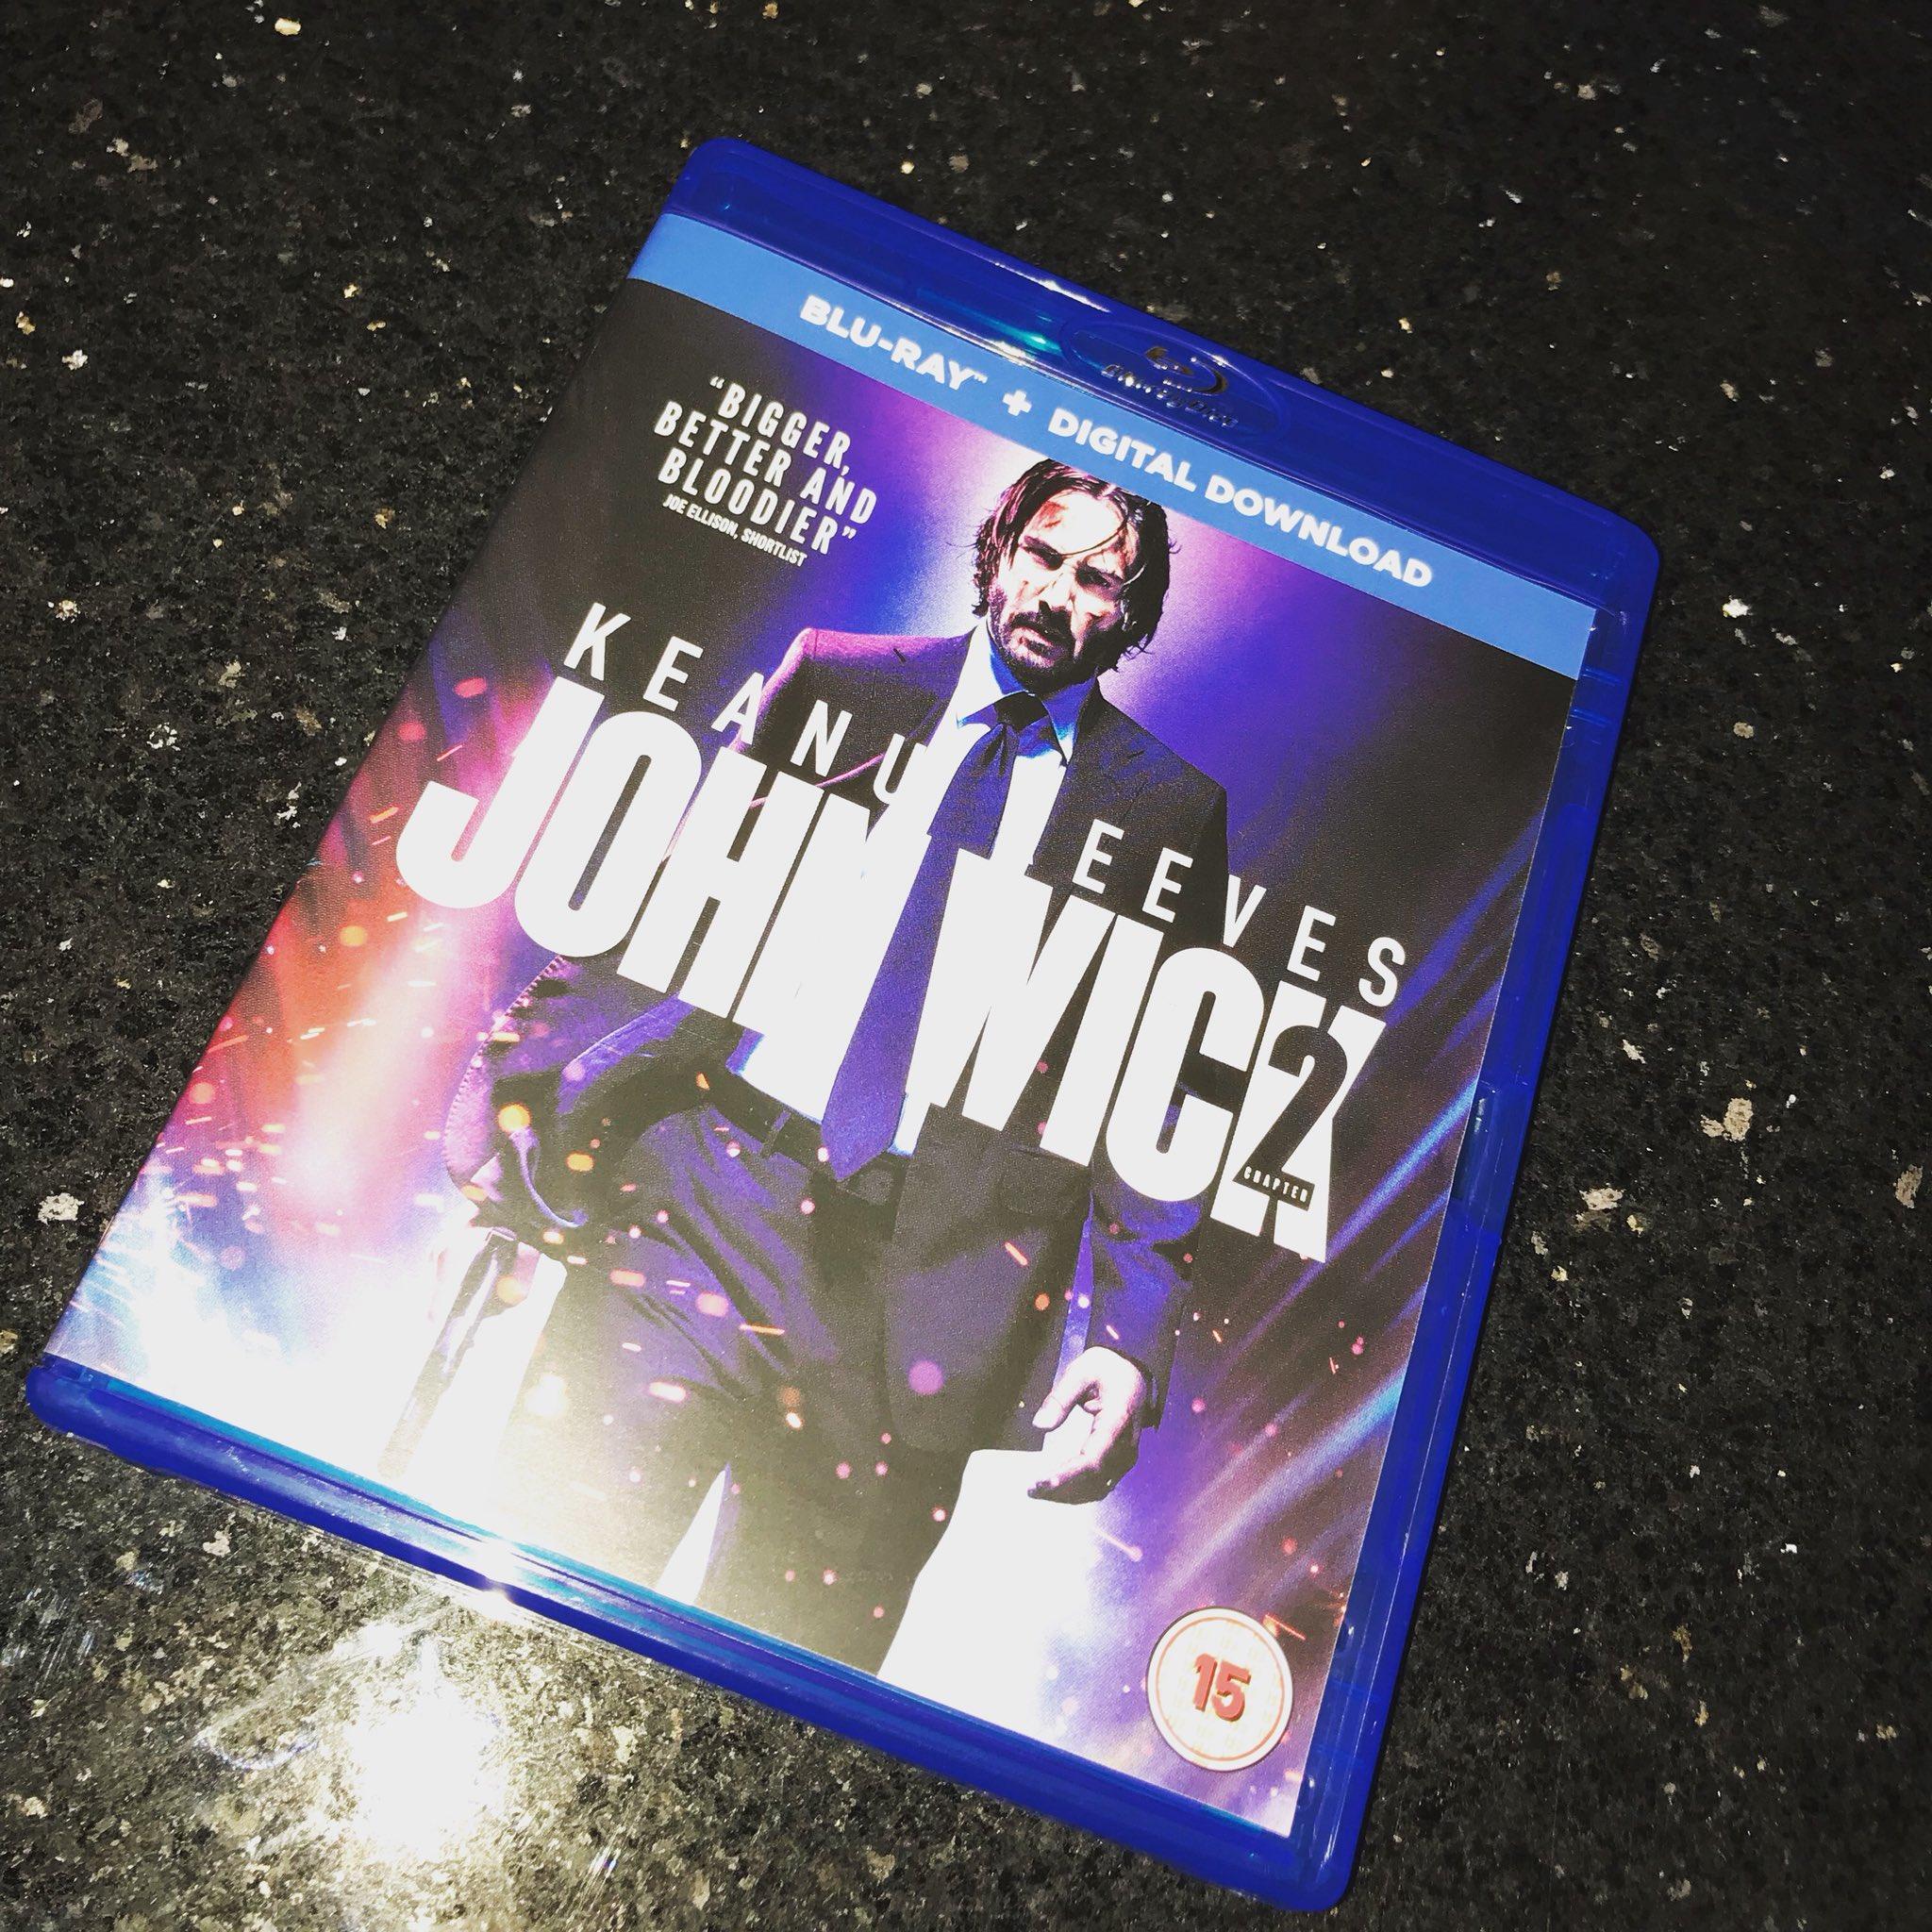 Tonight's entertainment #johnwick2 https://t.co/glhx1FOwSM